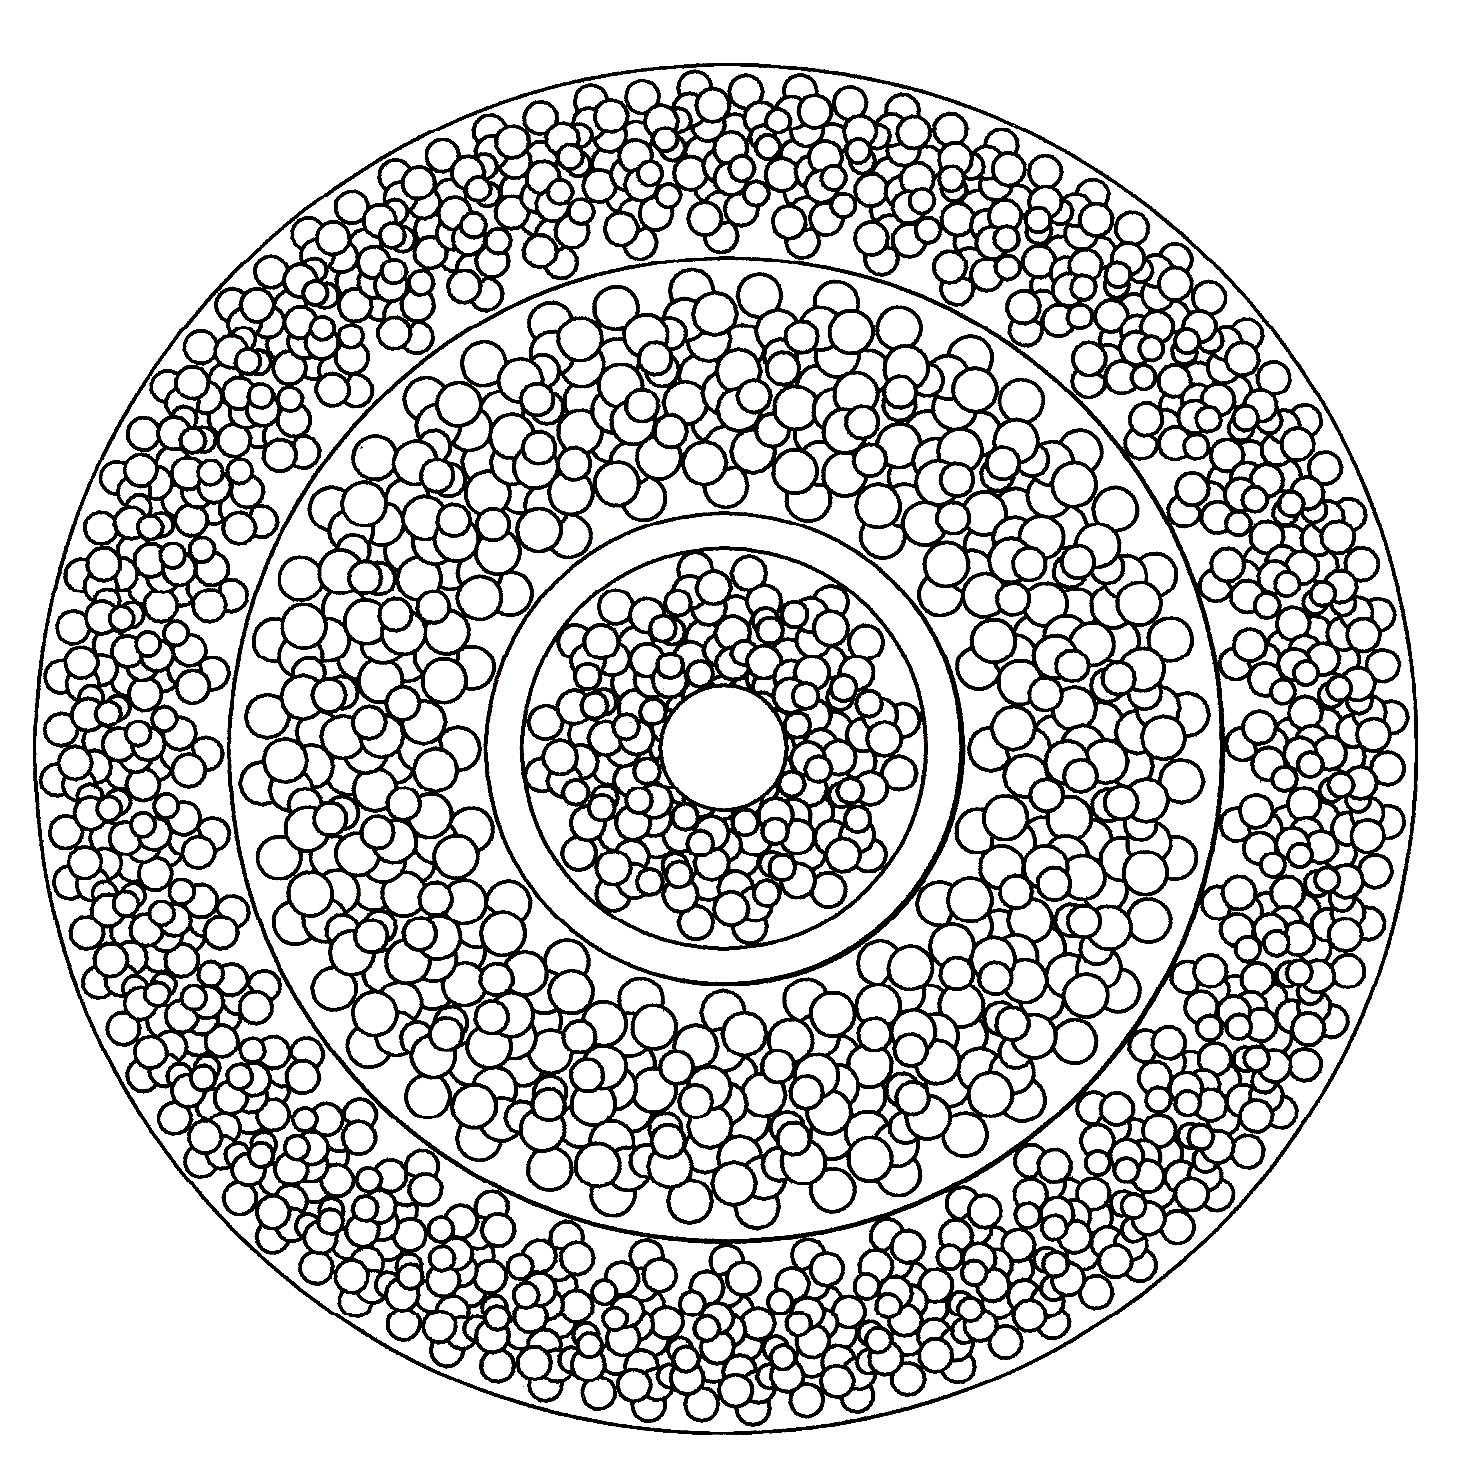 Colorear para adultos : Mandalas - 229